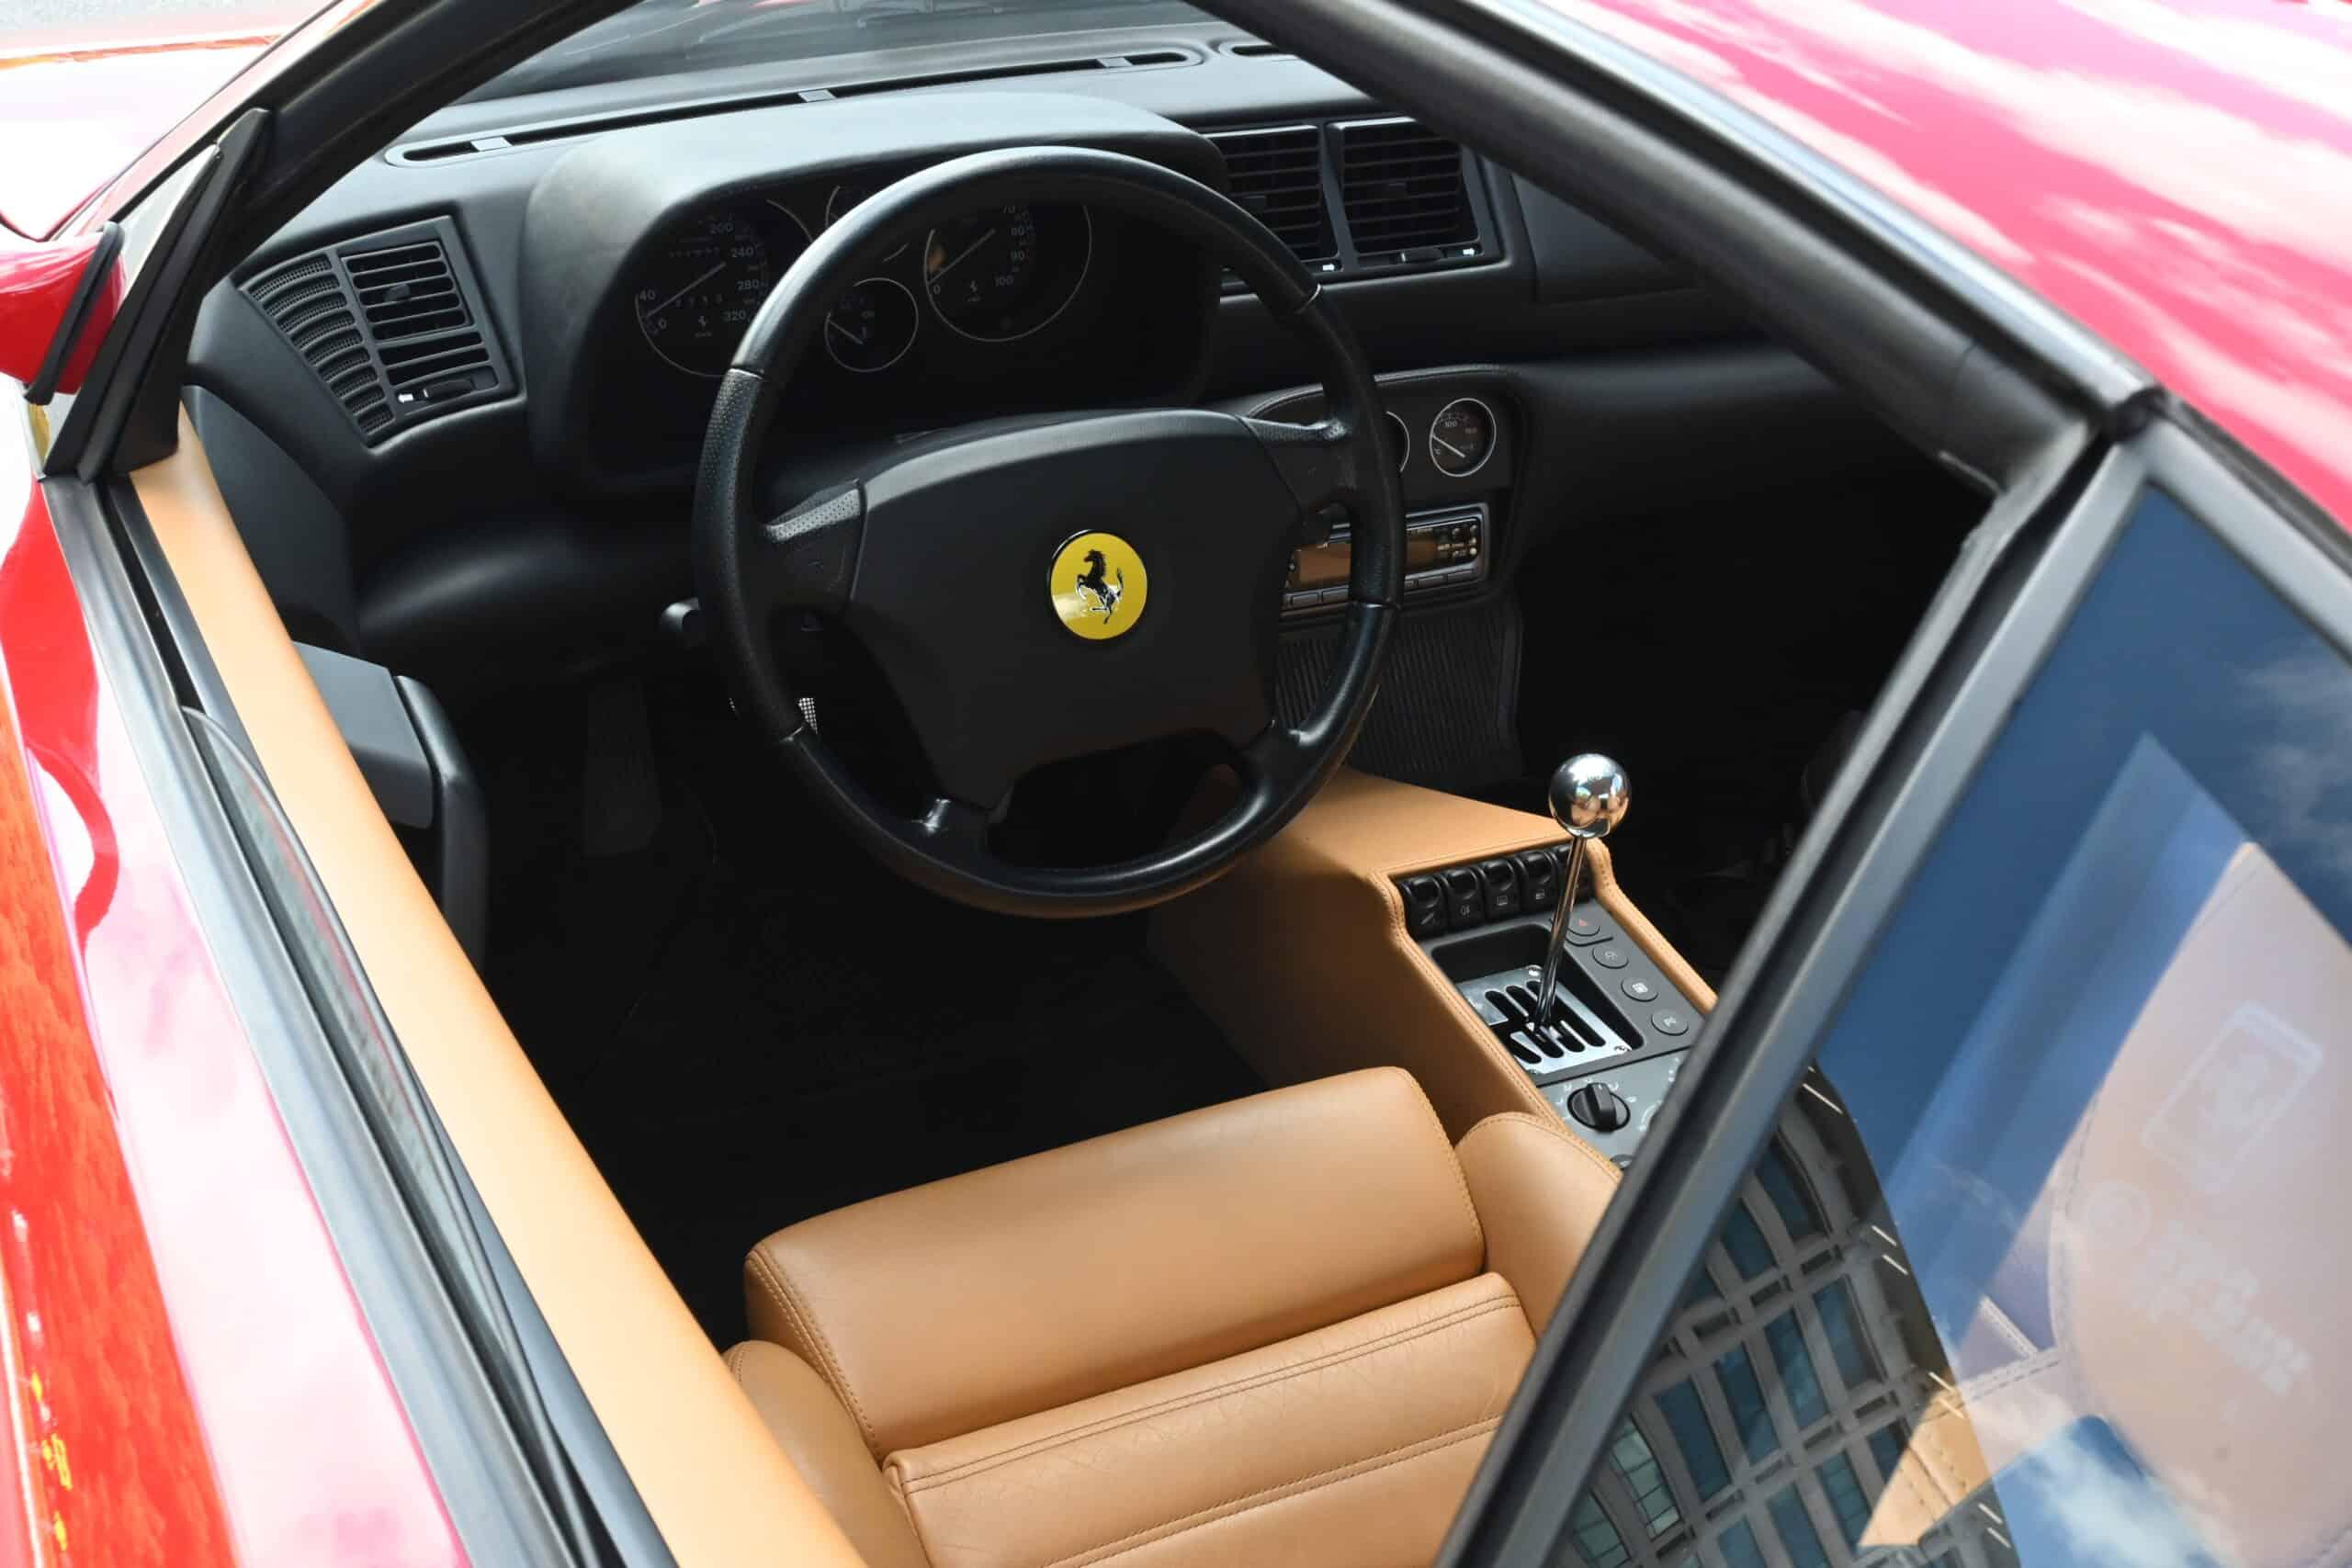 1996 Ferrari F355, 7K miles, Gated 6-speed Berlinetta, Serviced in April, Swiss market Car, 2 owners, original paint, unmolested